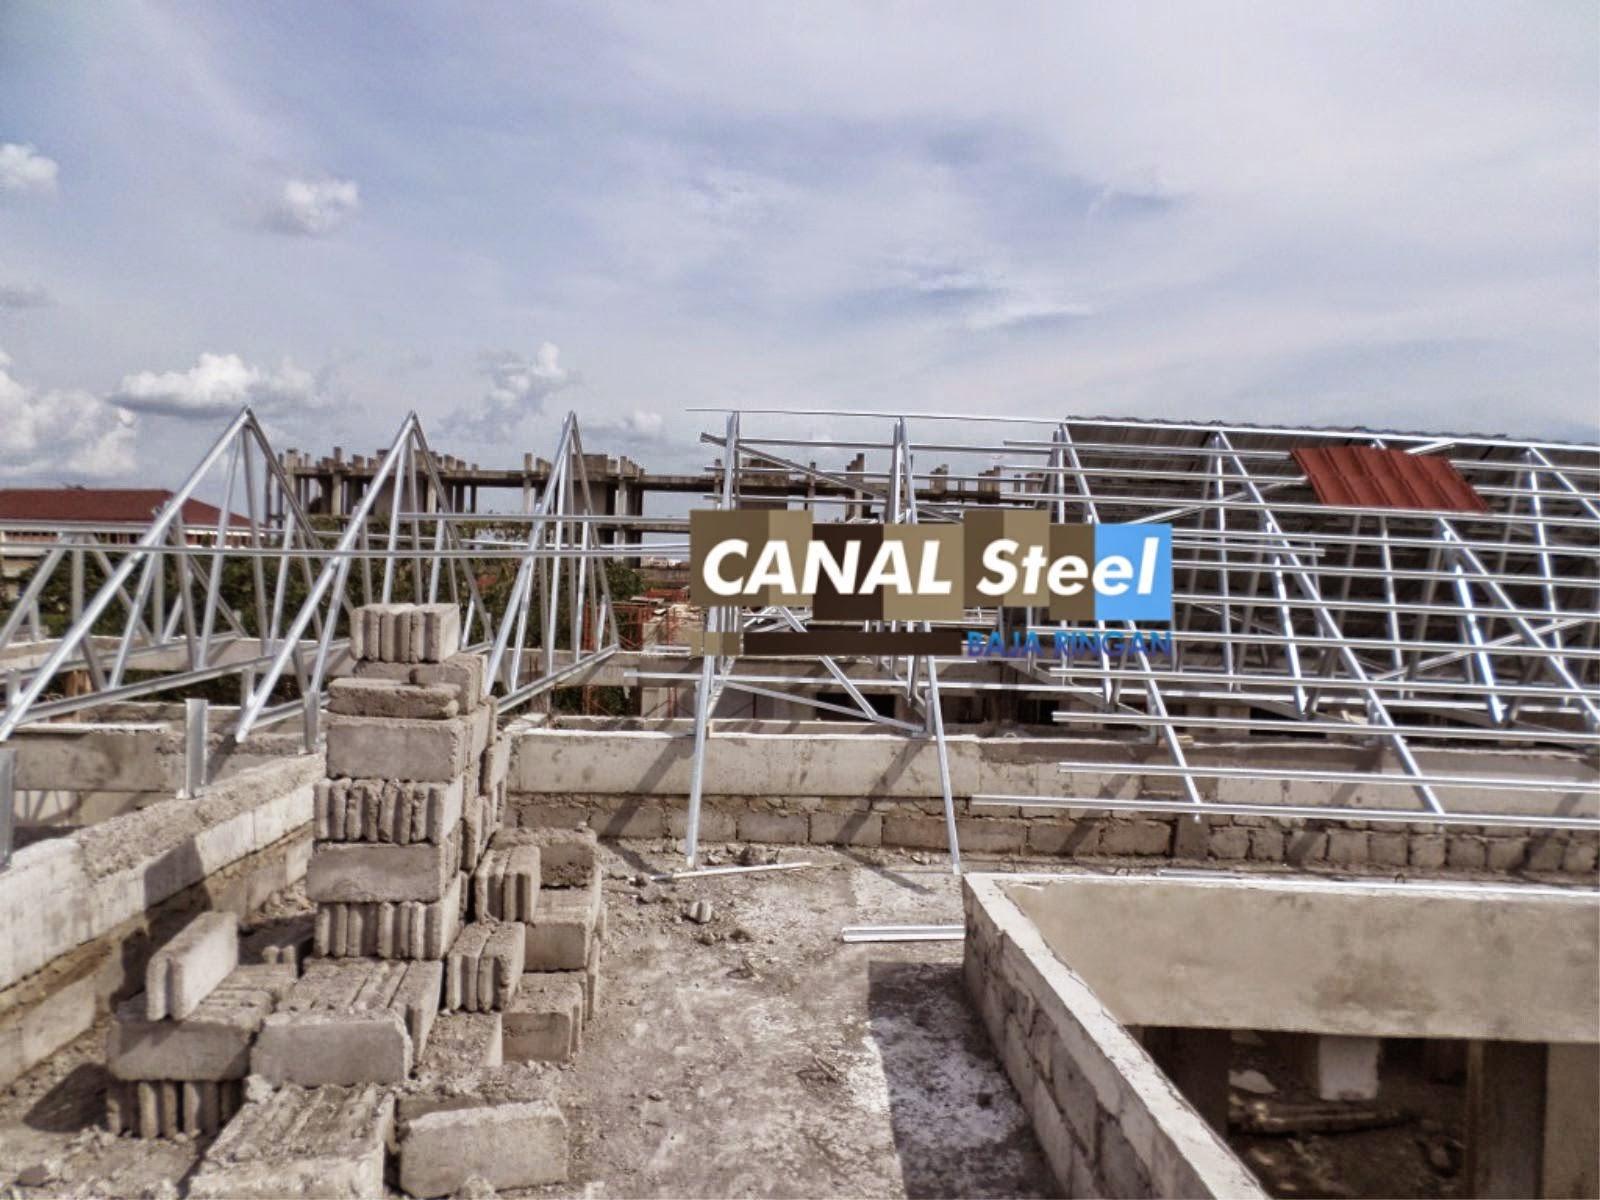 Harga Ongkos Pasang Atap Baja Ringan Jual Jogja | Magelang Purworejo Klaten ...